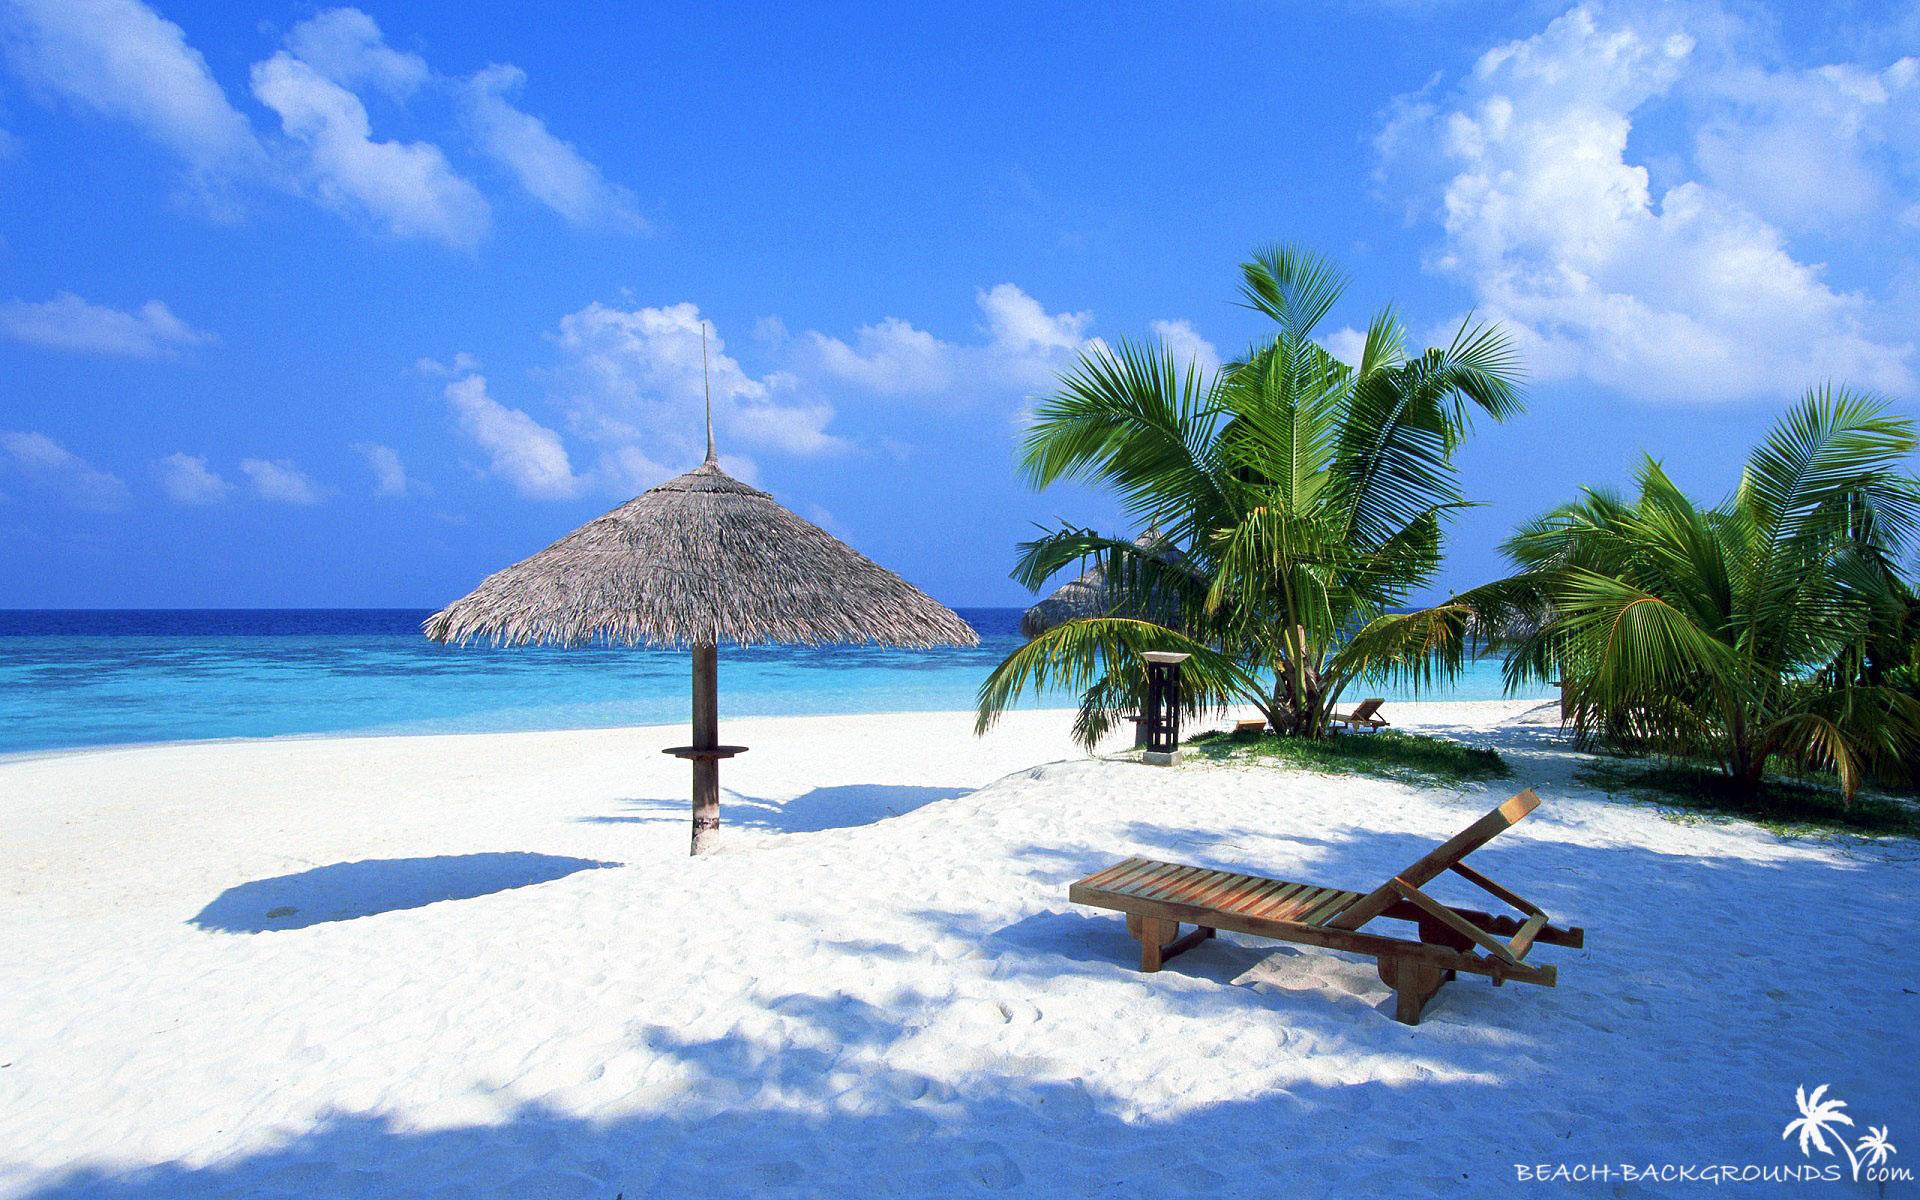 Vacation Destination Holiday Wallpaper